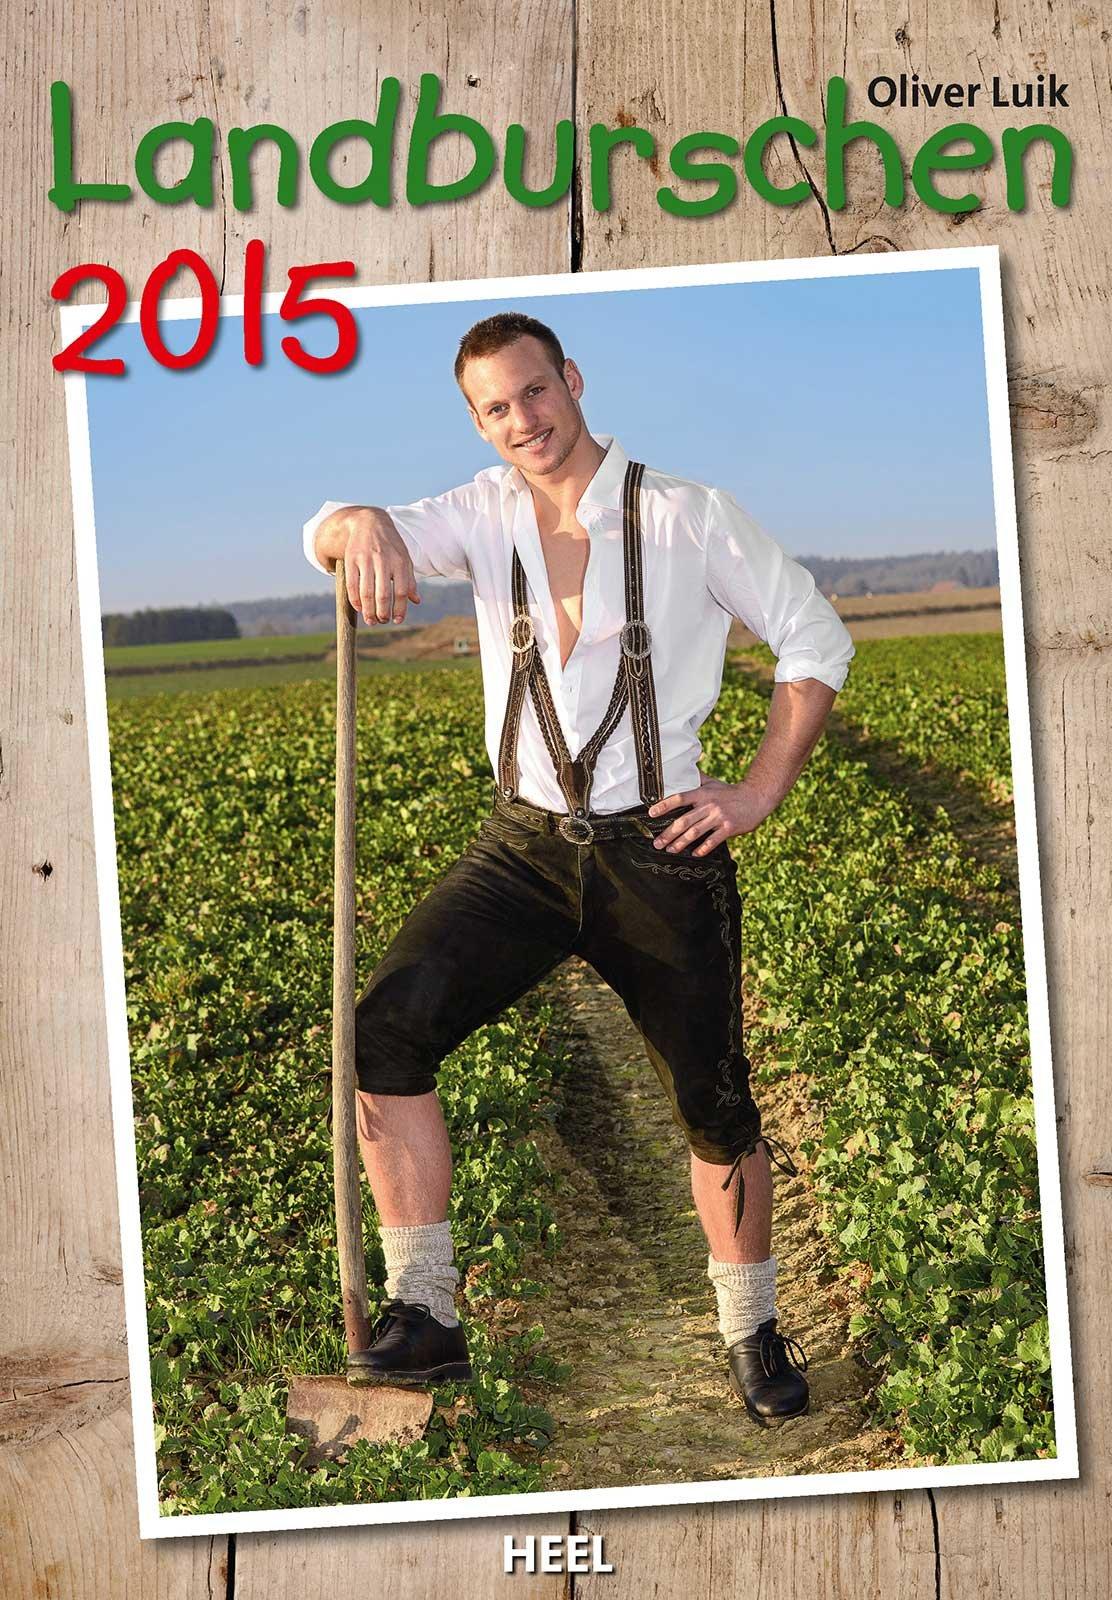 Landburschen 2015